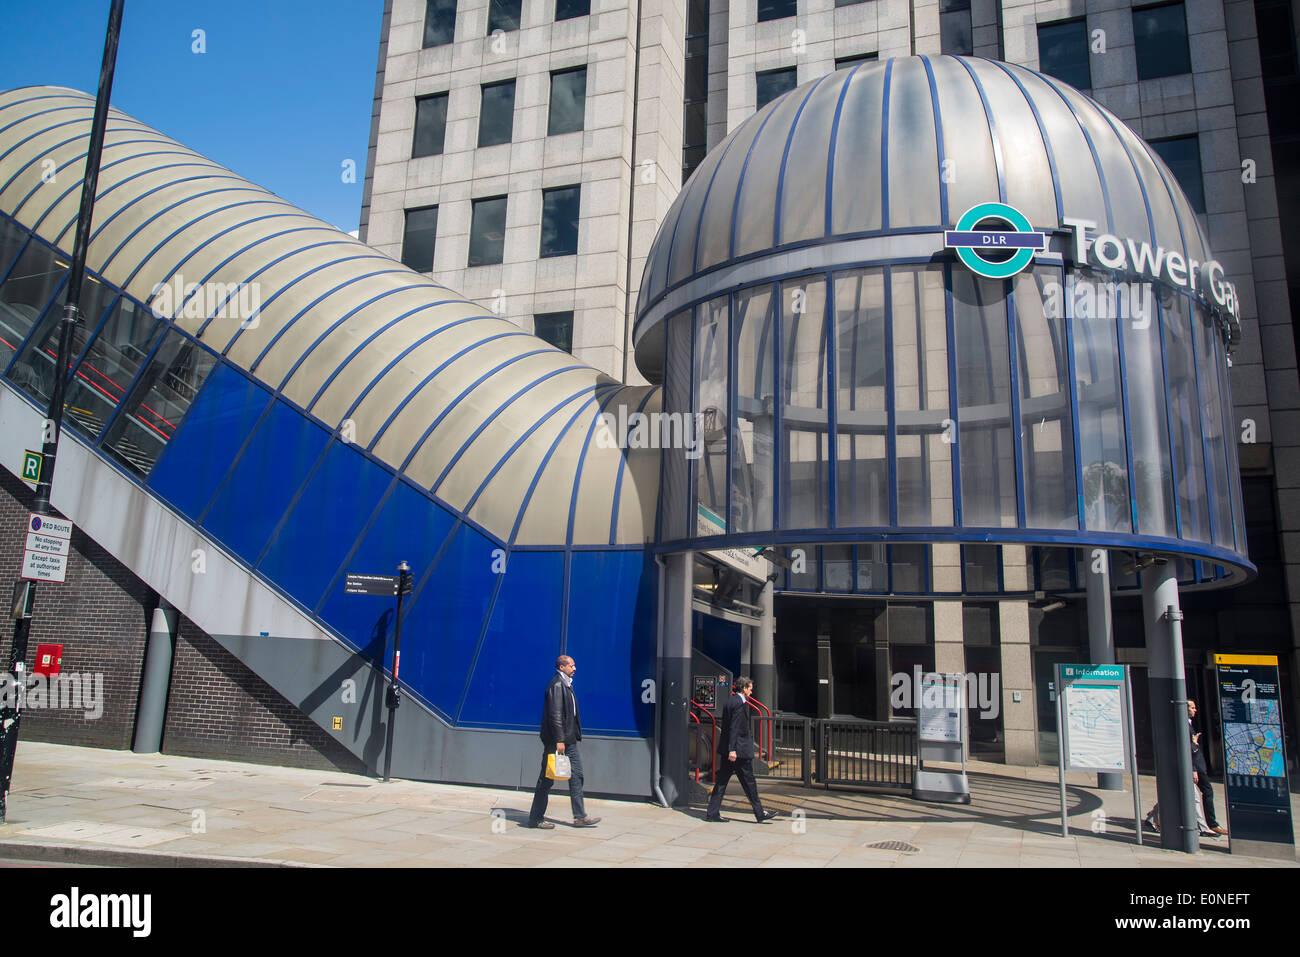 Tower Gateway DLR station, Tower Hamlets, London, UK - Stock Image